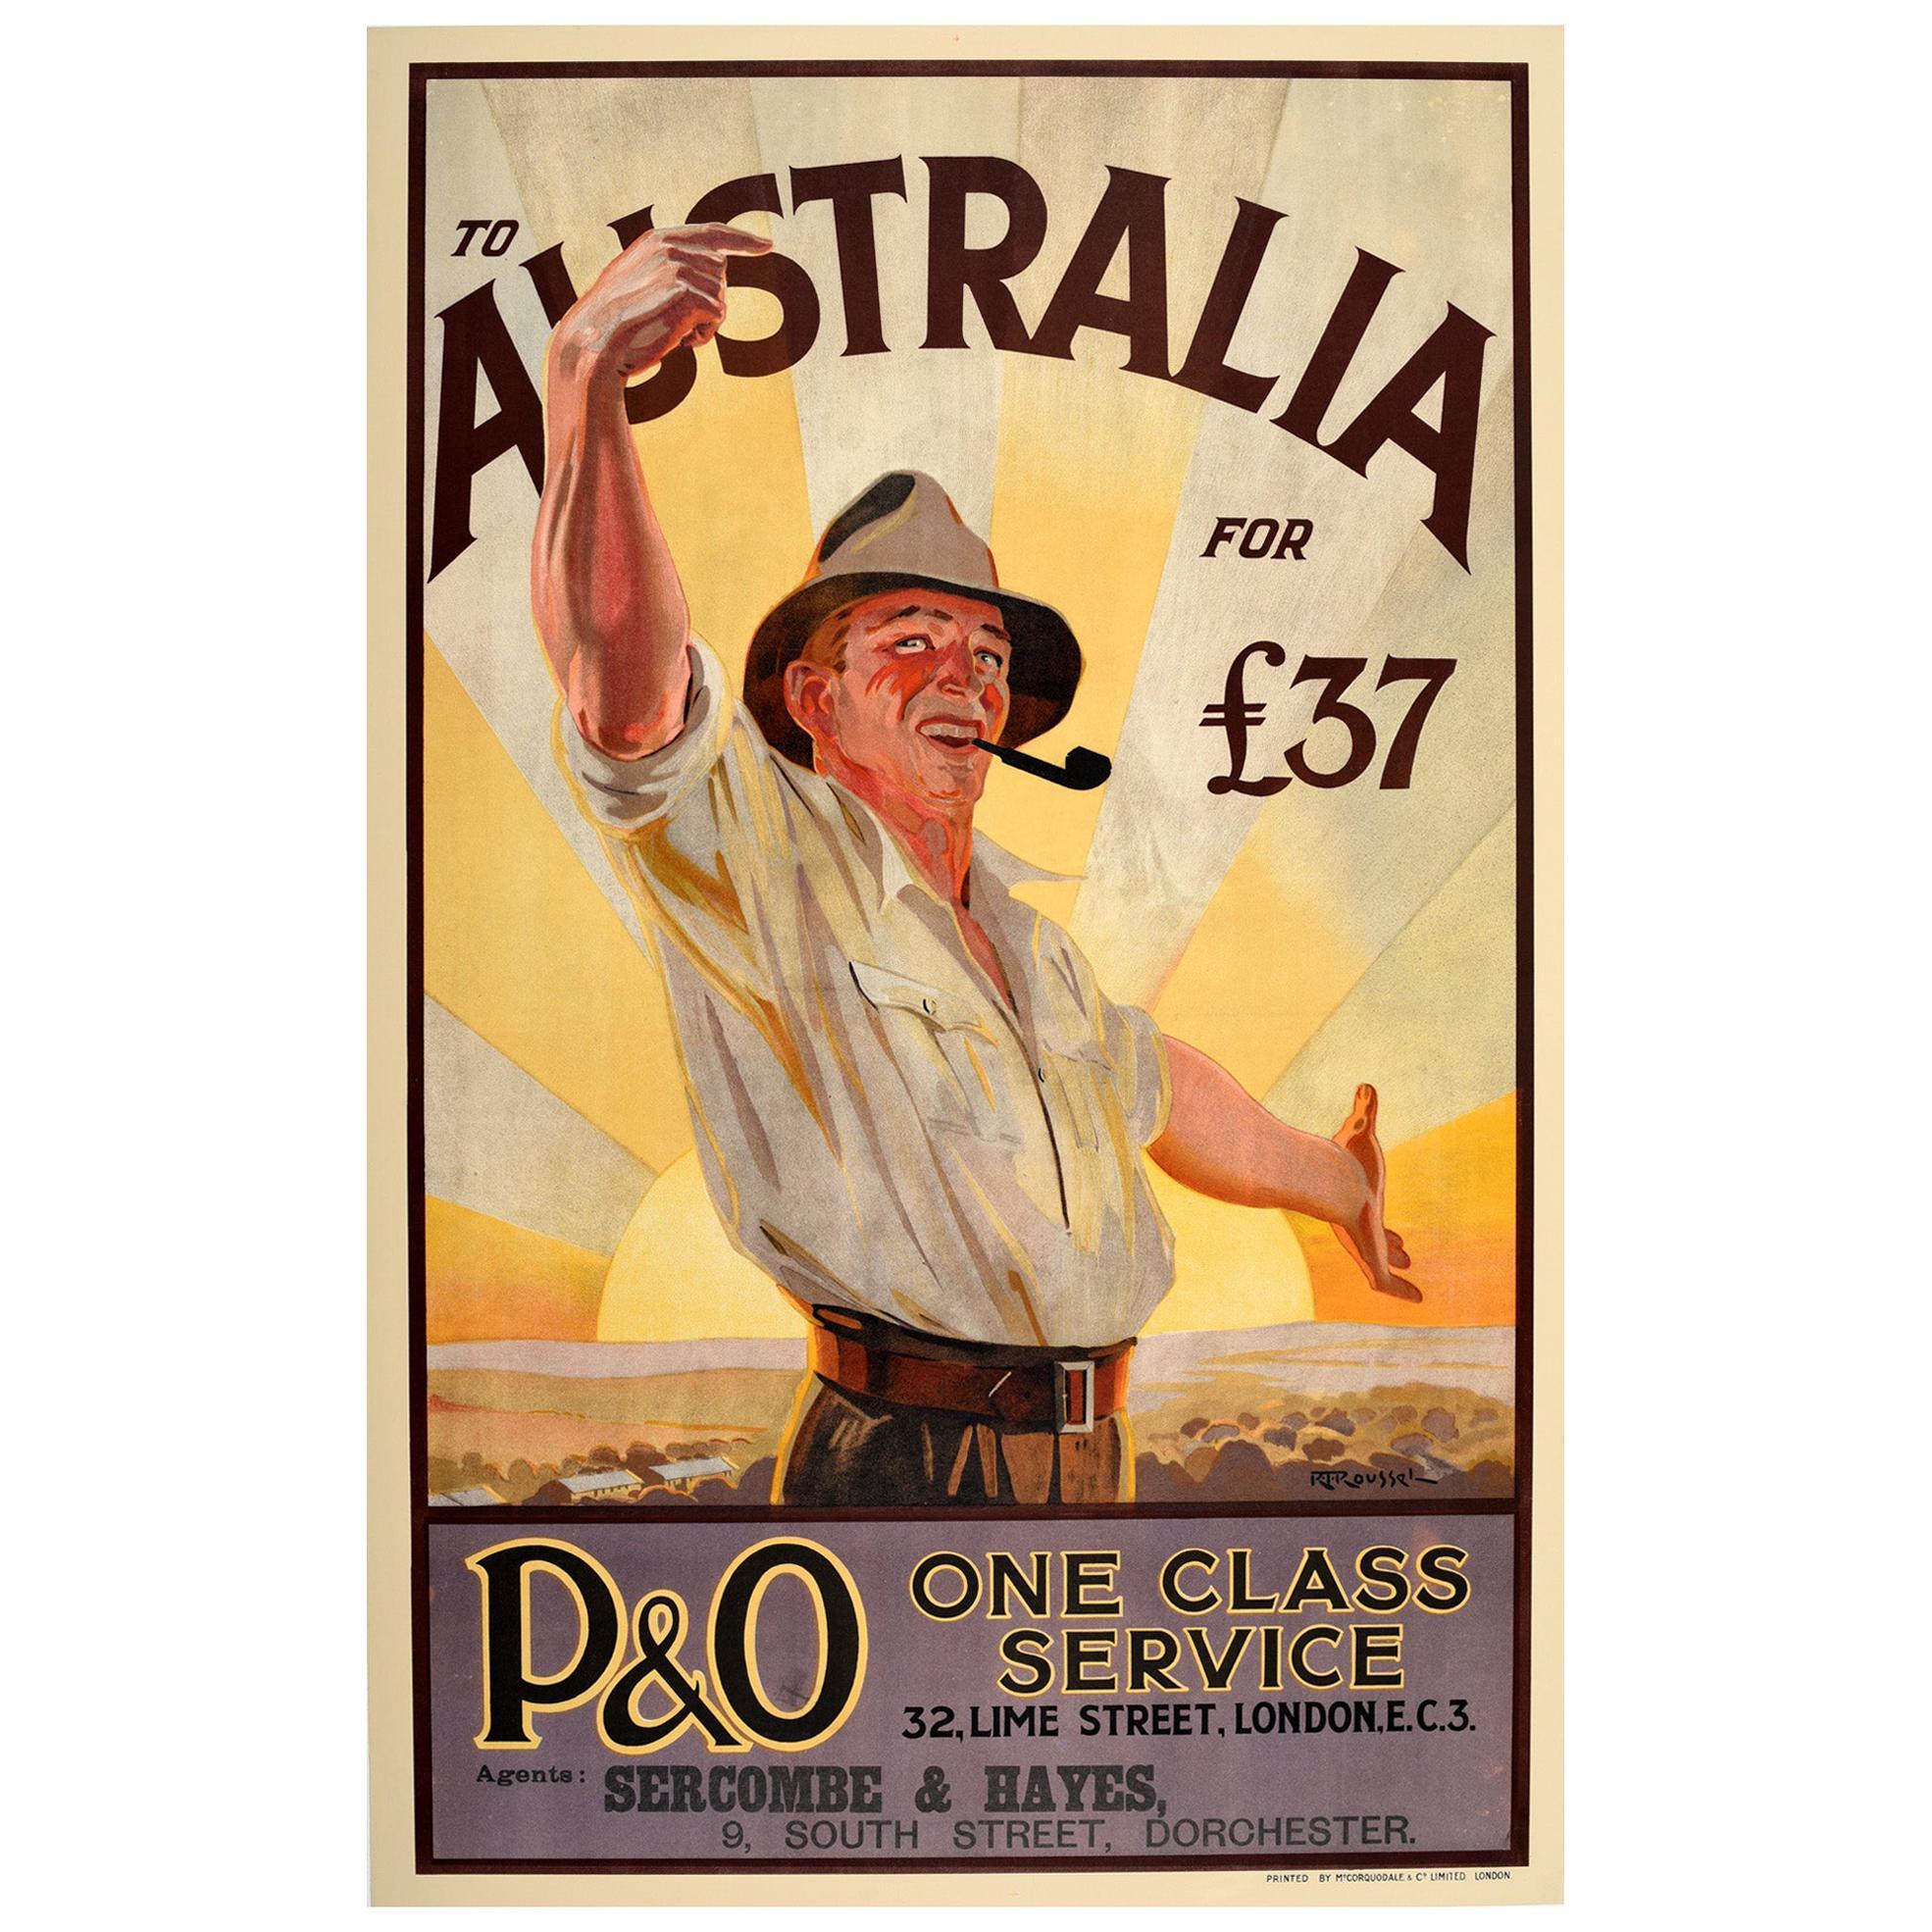 Original Vintage Poster To Australia P&O Cruise Travel Art Countryside Welcome